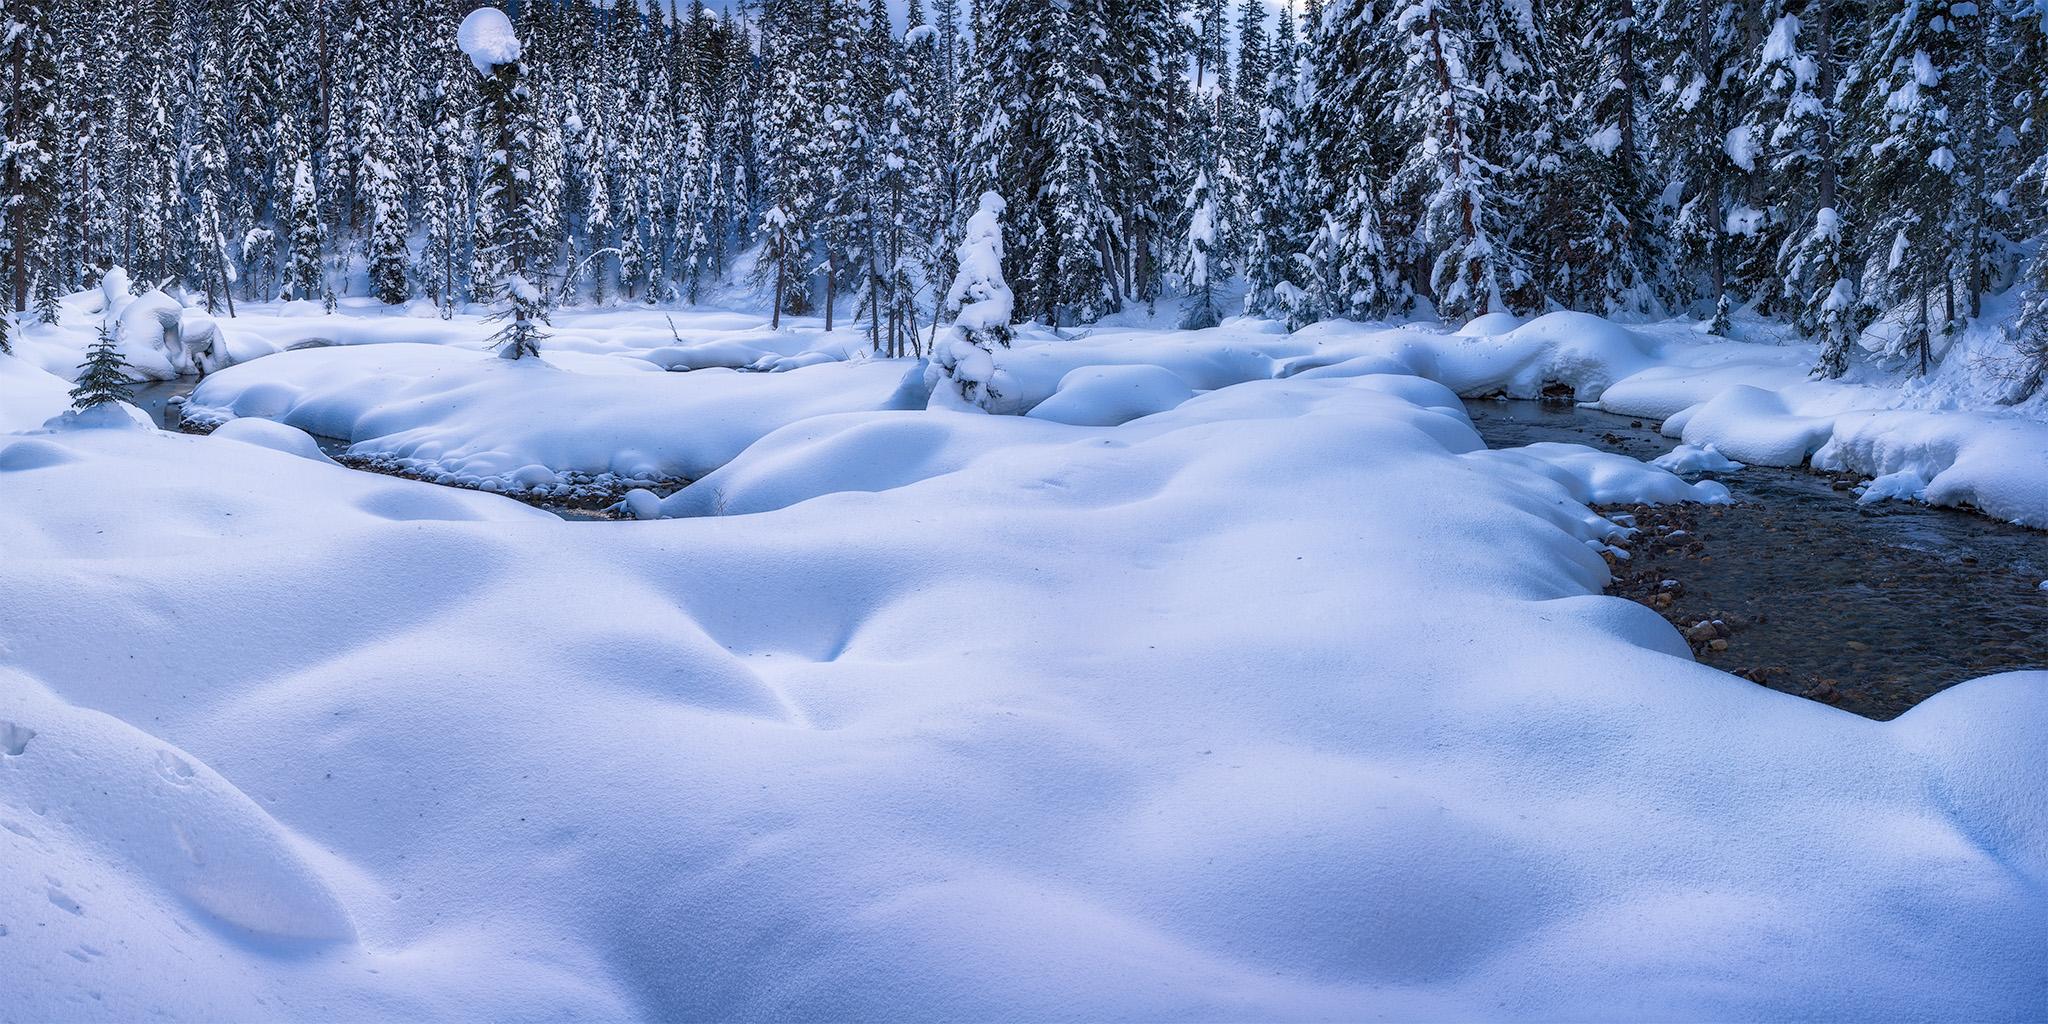 Landscape Photography near Emerald Lake. A frozen creek winds around snow pillows